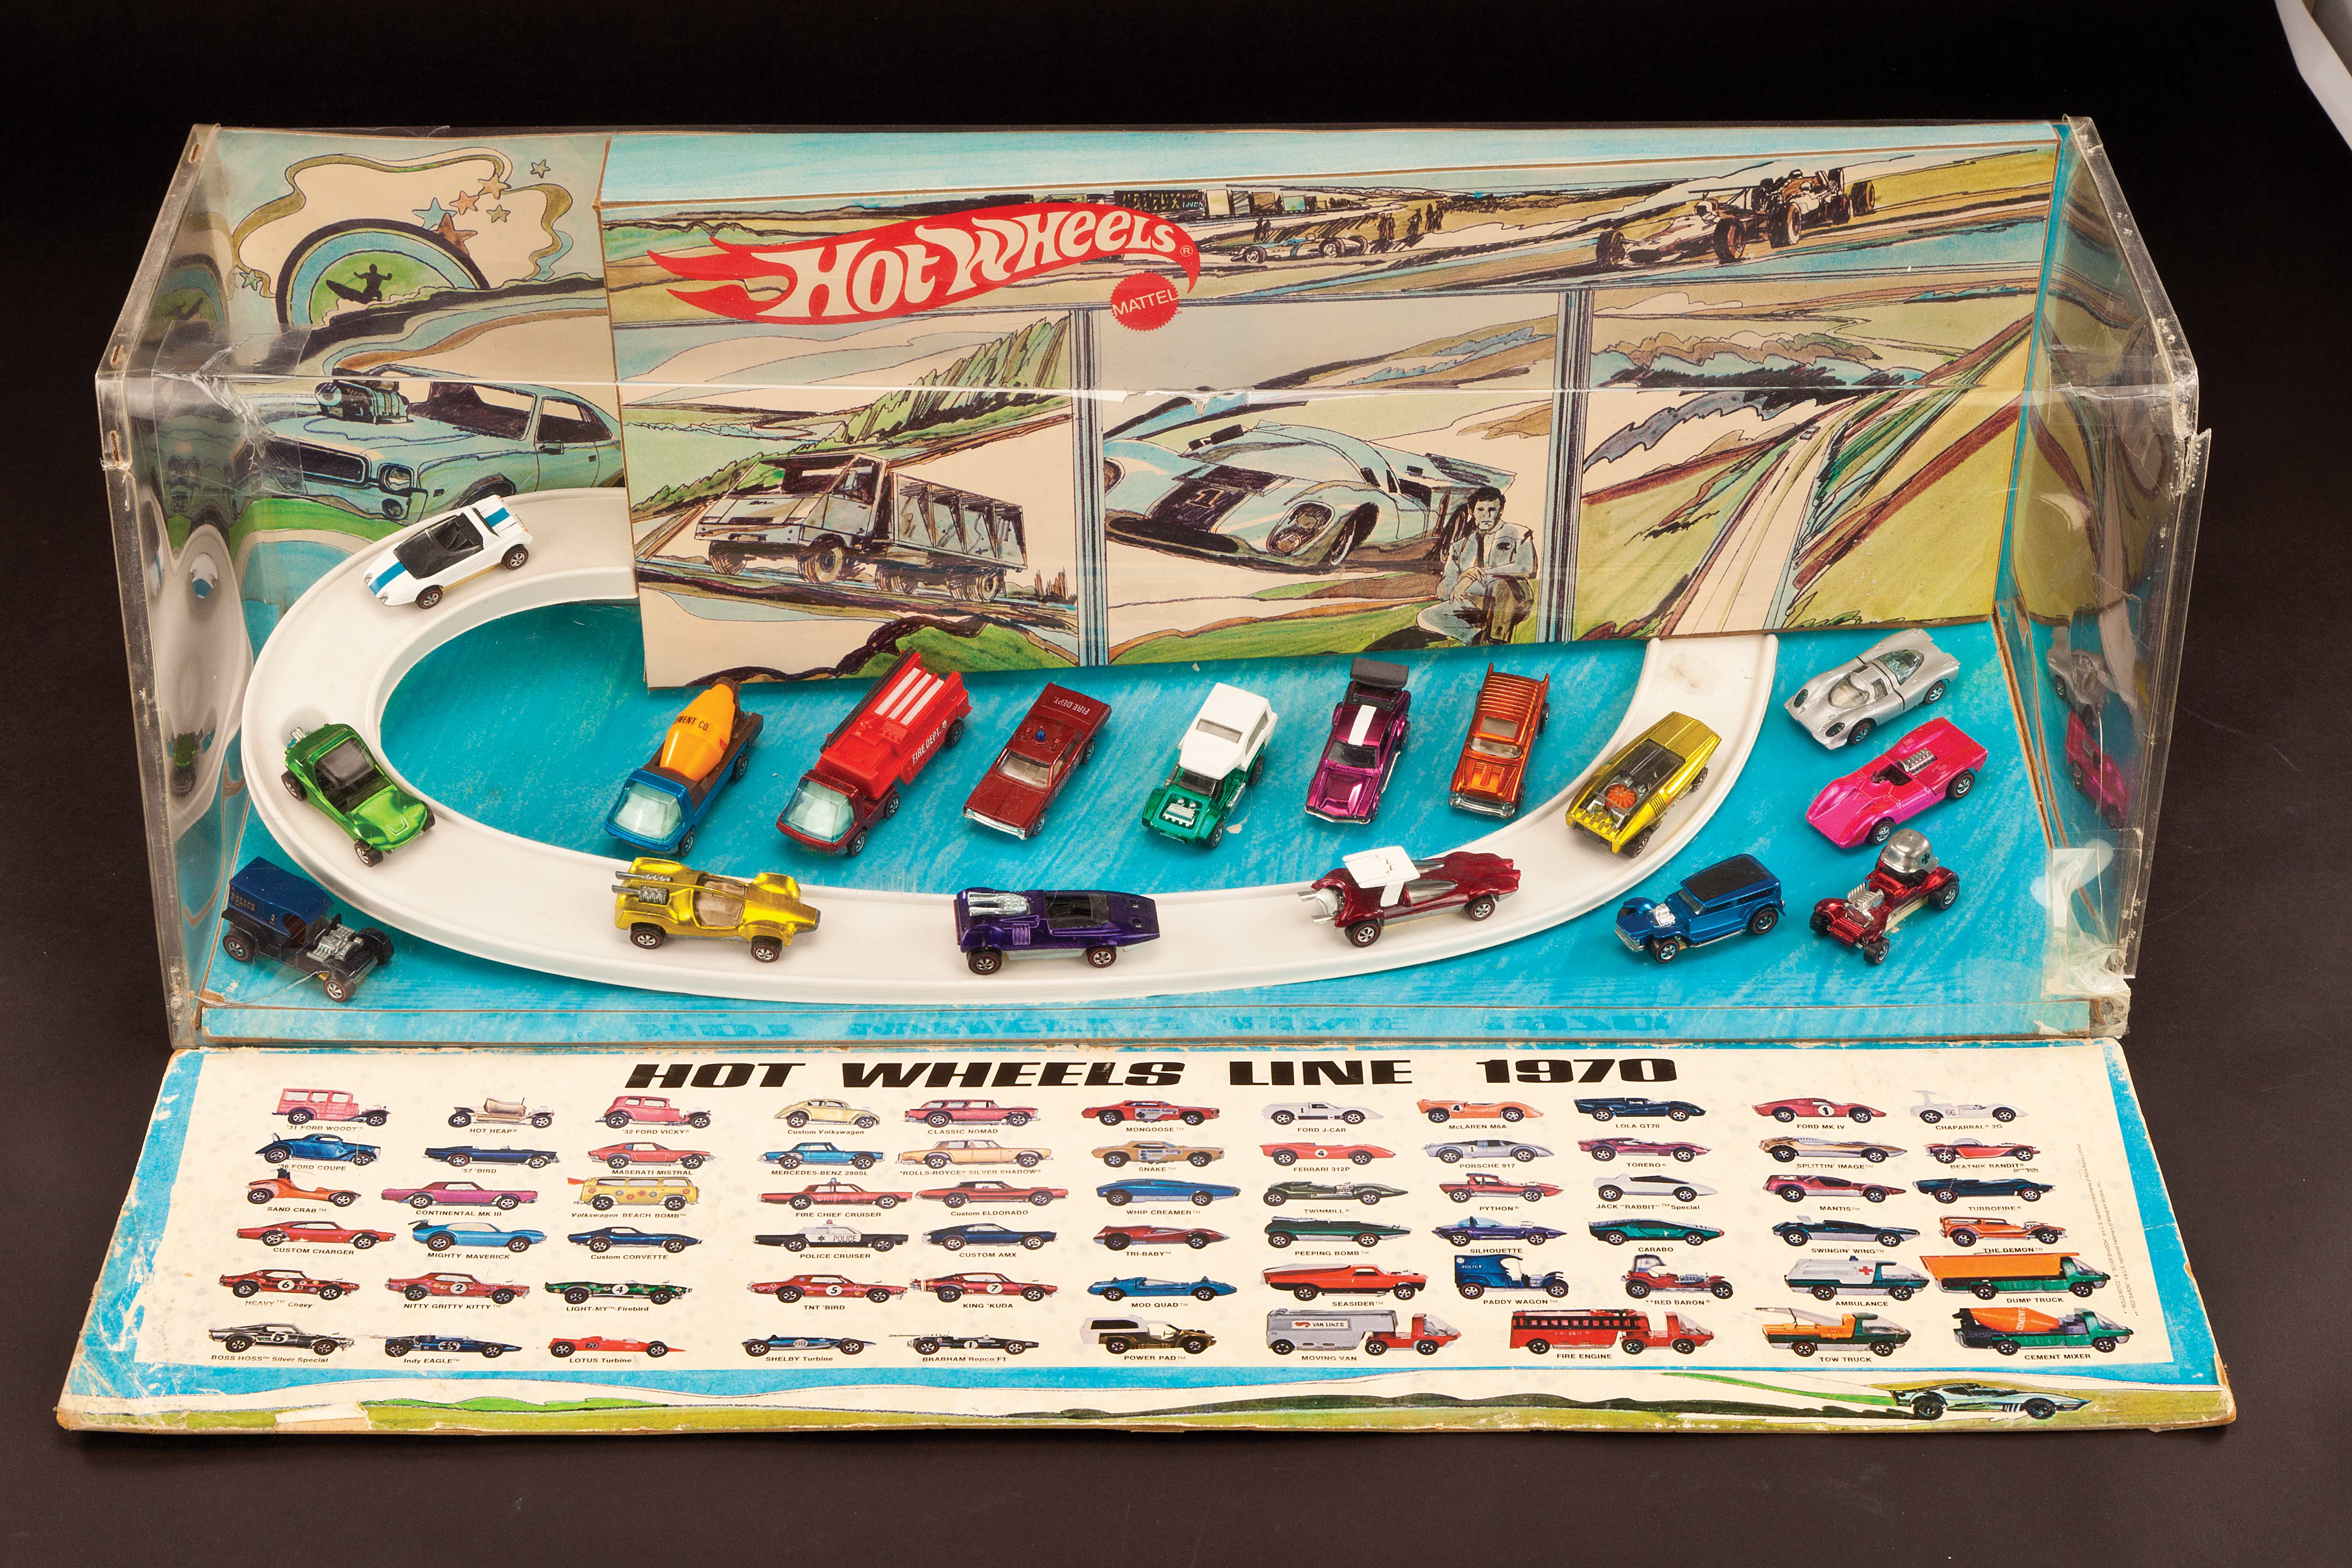 GI Joe And Hot Wheels Headline Massive Vintage Toy Auction